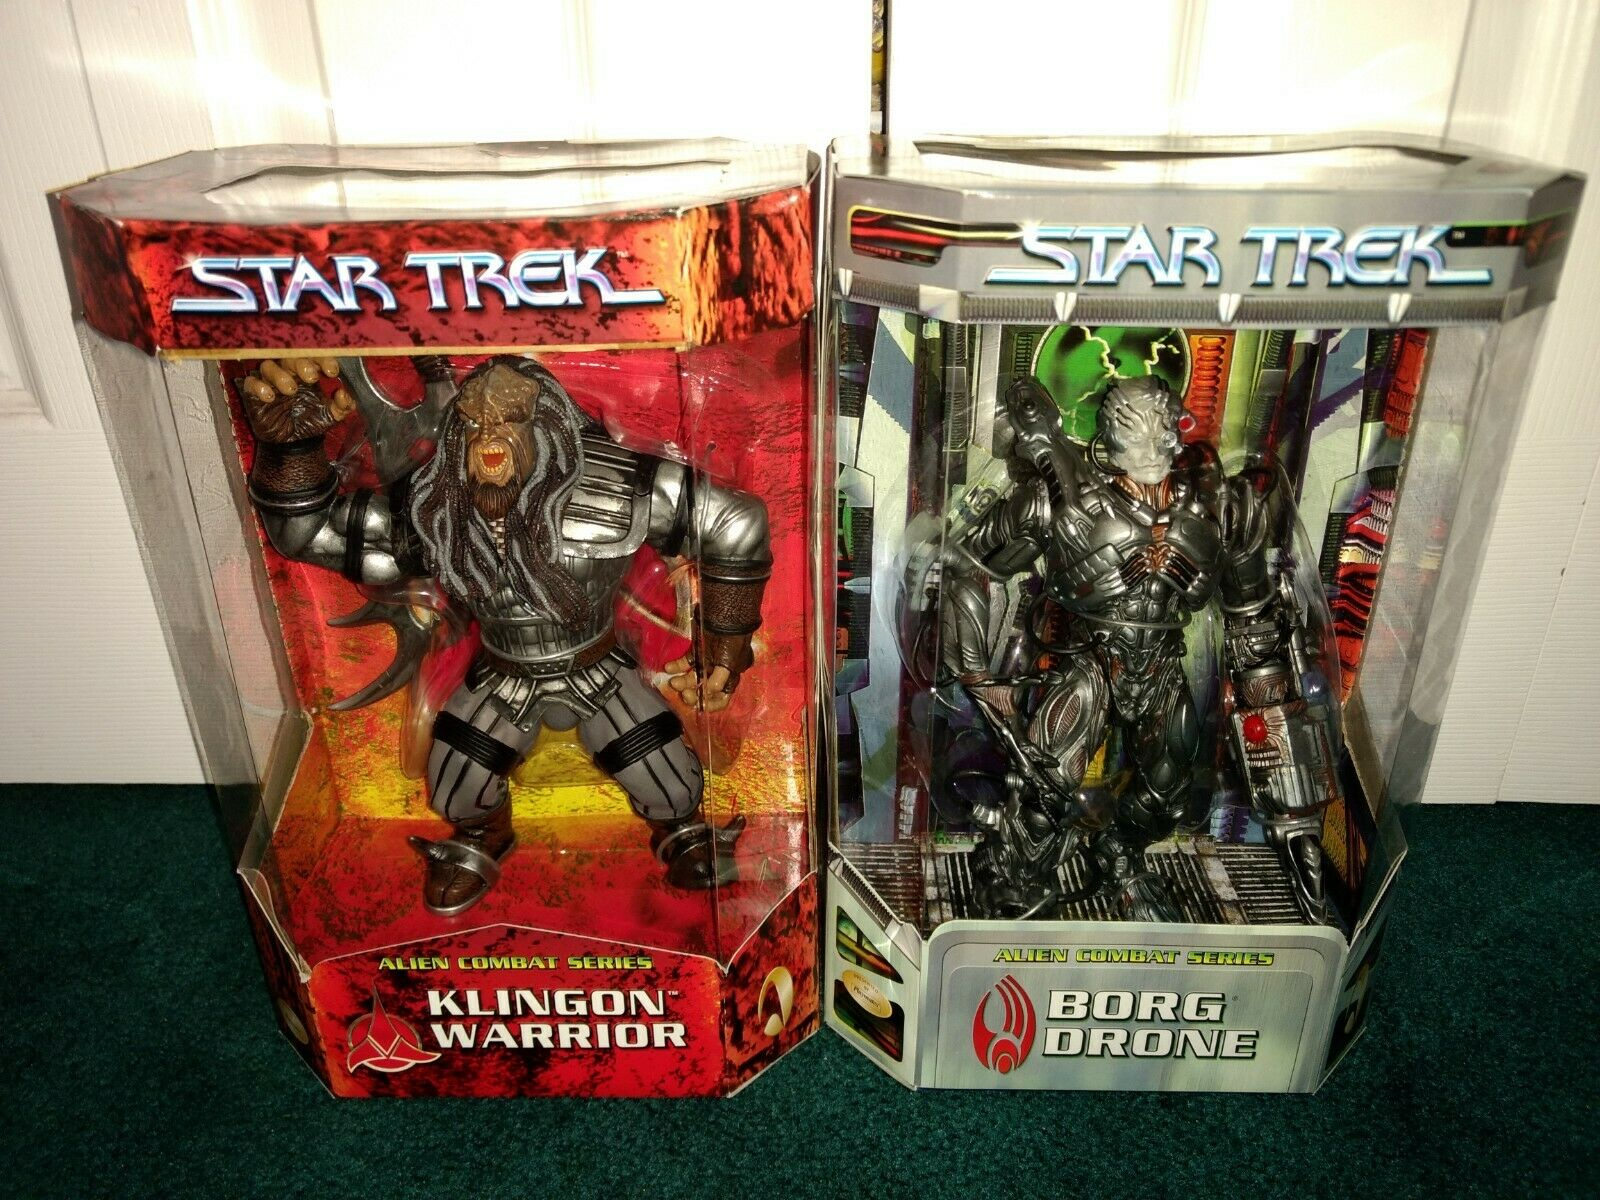 Star Trek 9in. Playmates Alien Combat Series Borg Drone & Klingon Warrior MISP